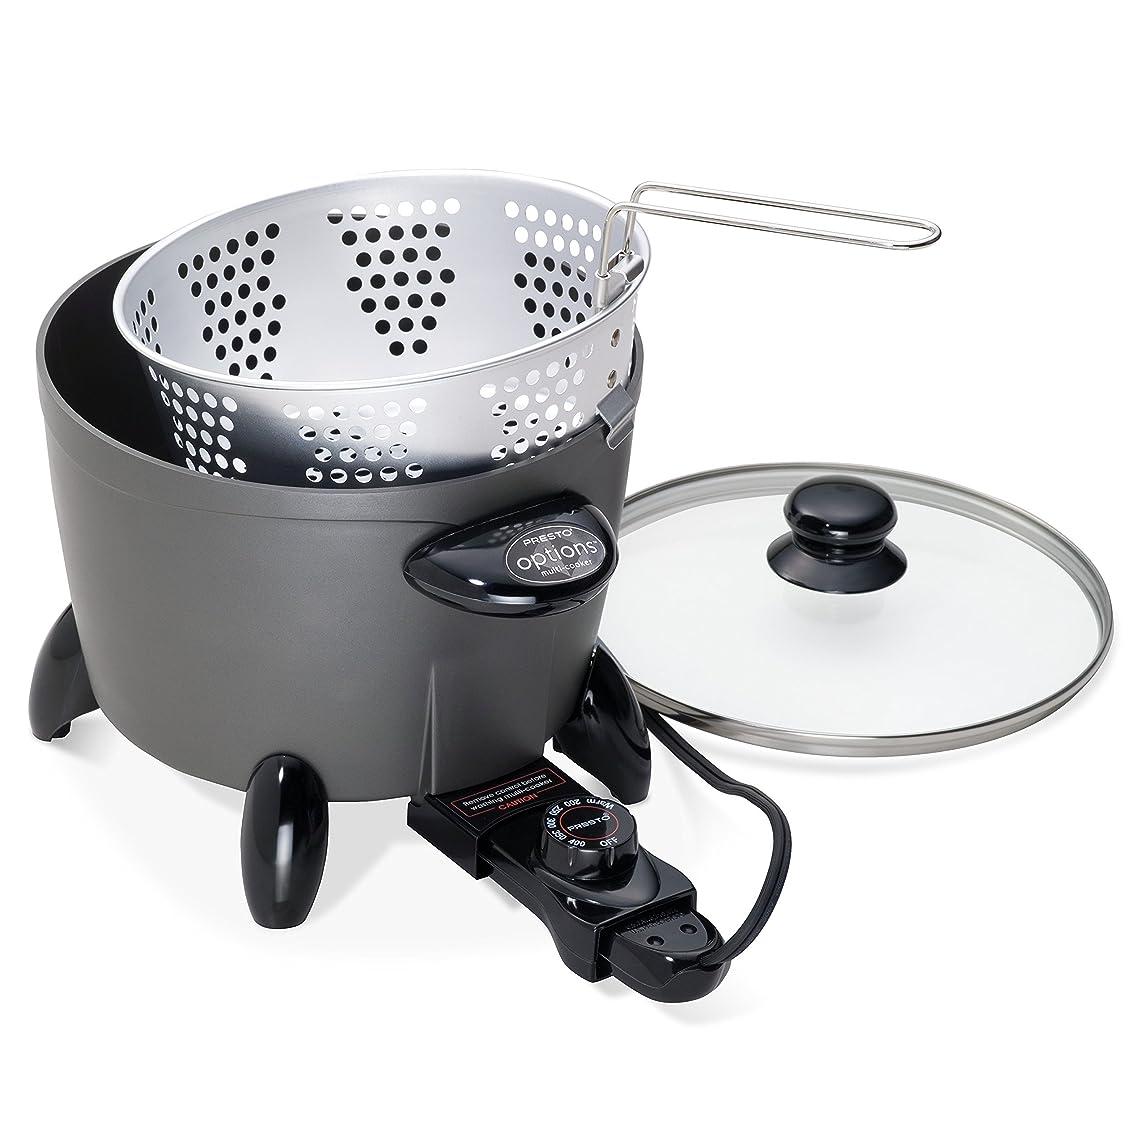 Presto 06003 Options Electric Multi-Cooker/Steamer (Renewed)